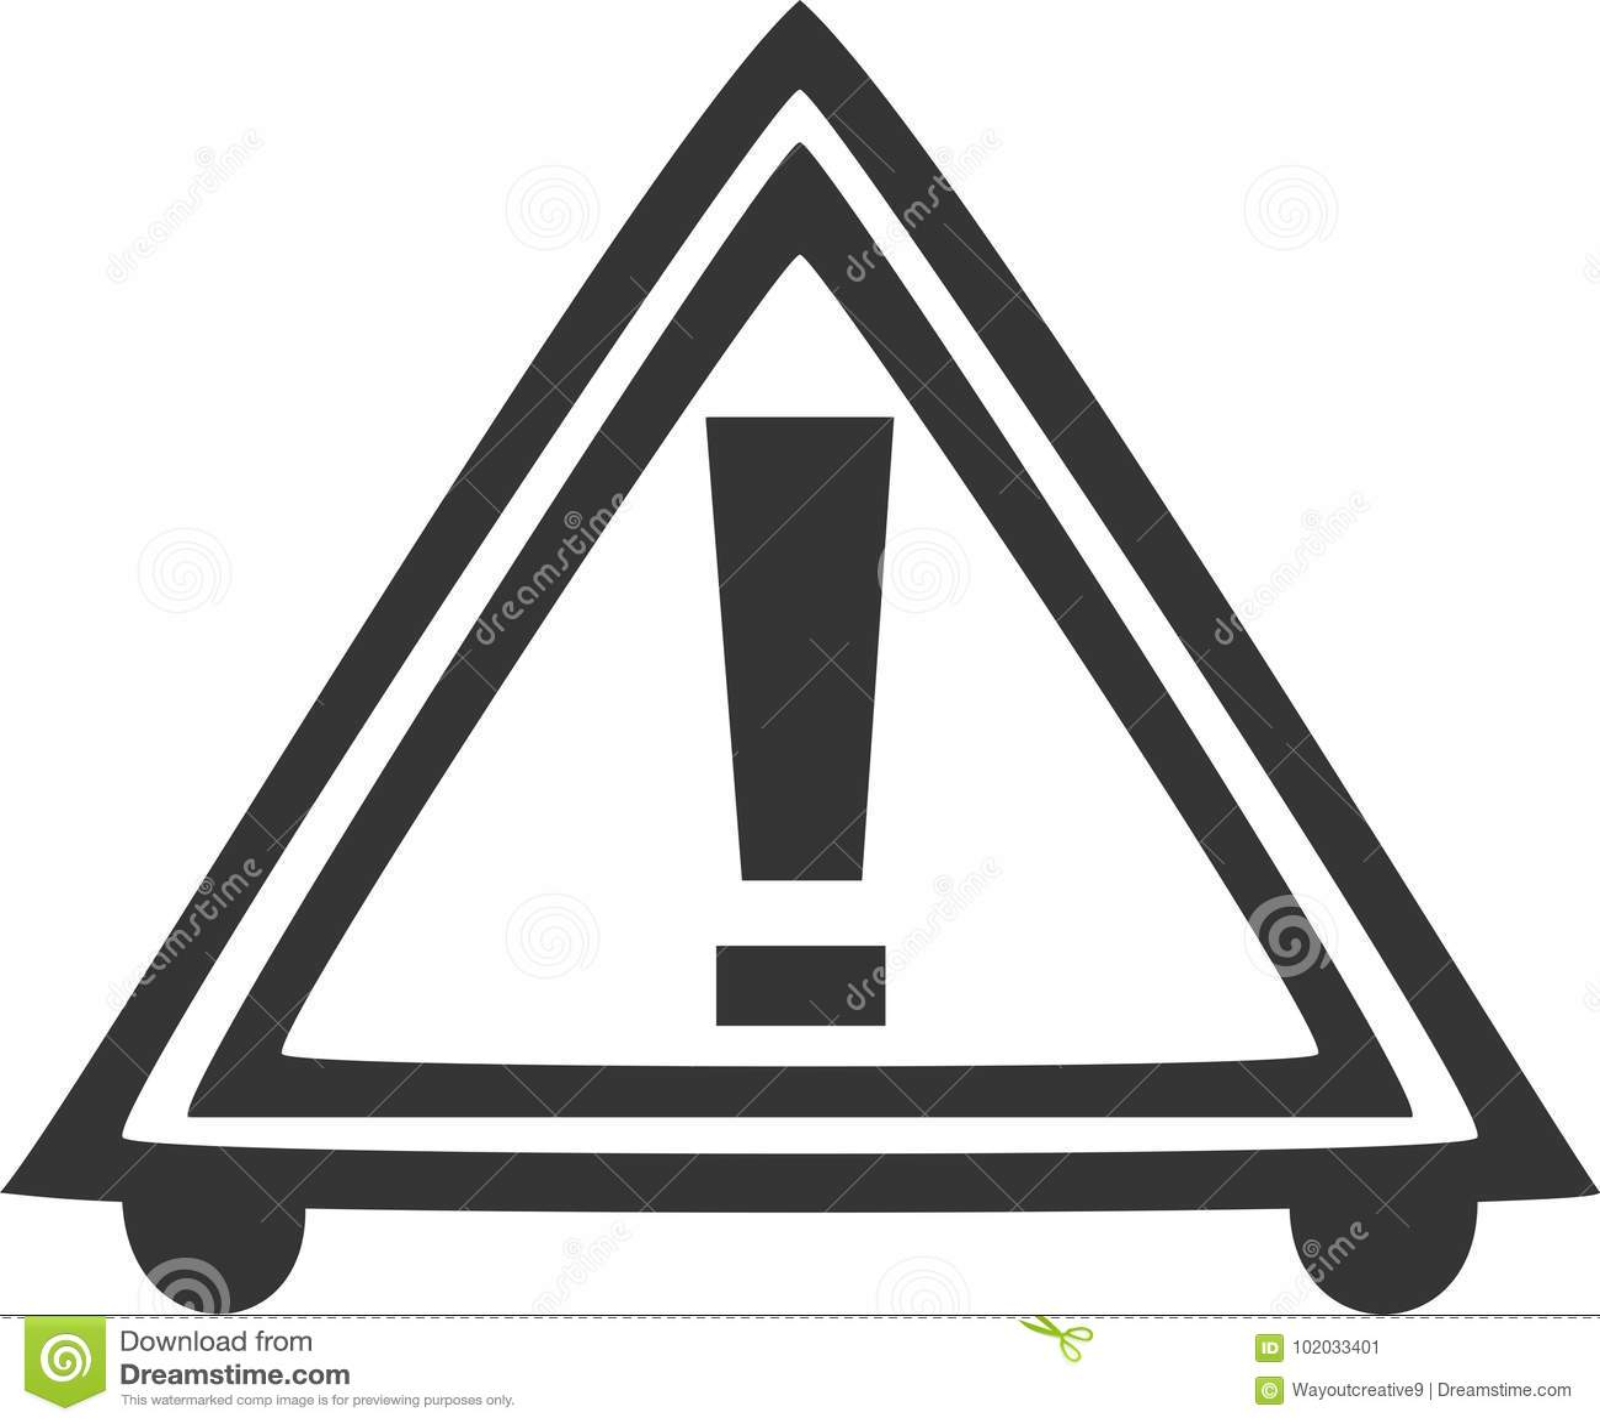 Road Hazard Triangle Caution Warning Sign Stock Vector